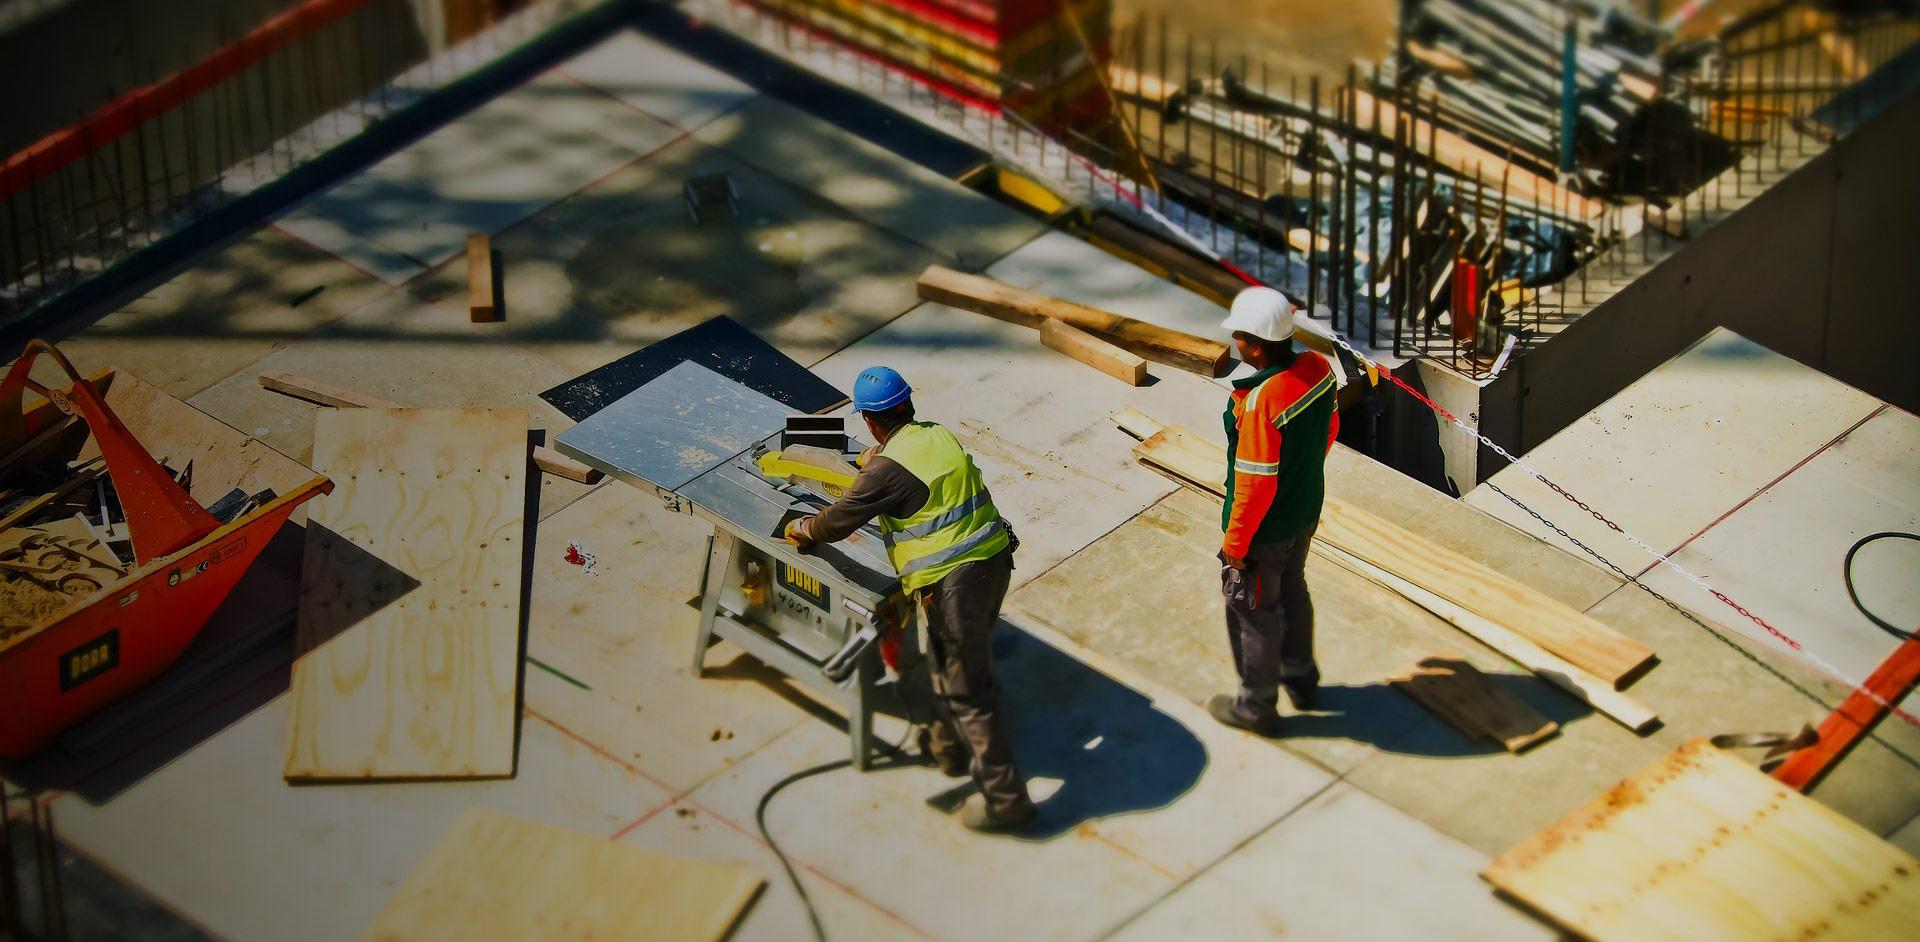 Baustelle-Monteure-Bauarbeiter-Tischkreissaege